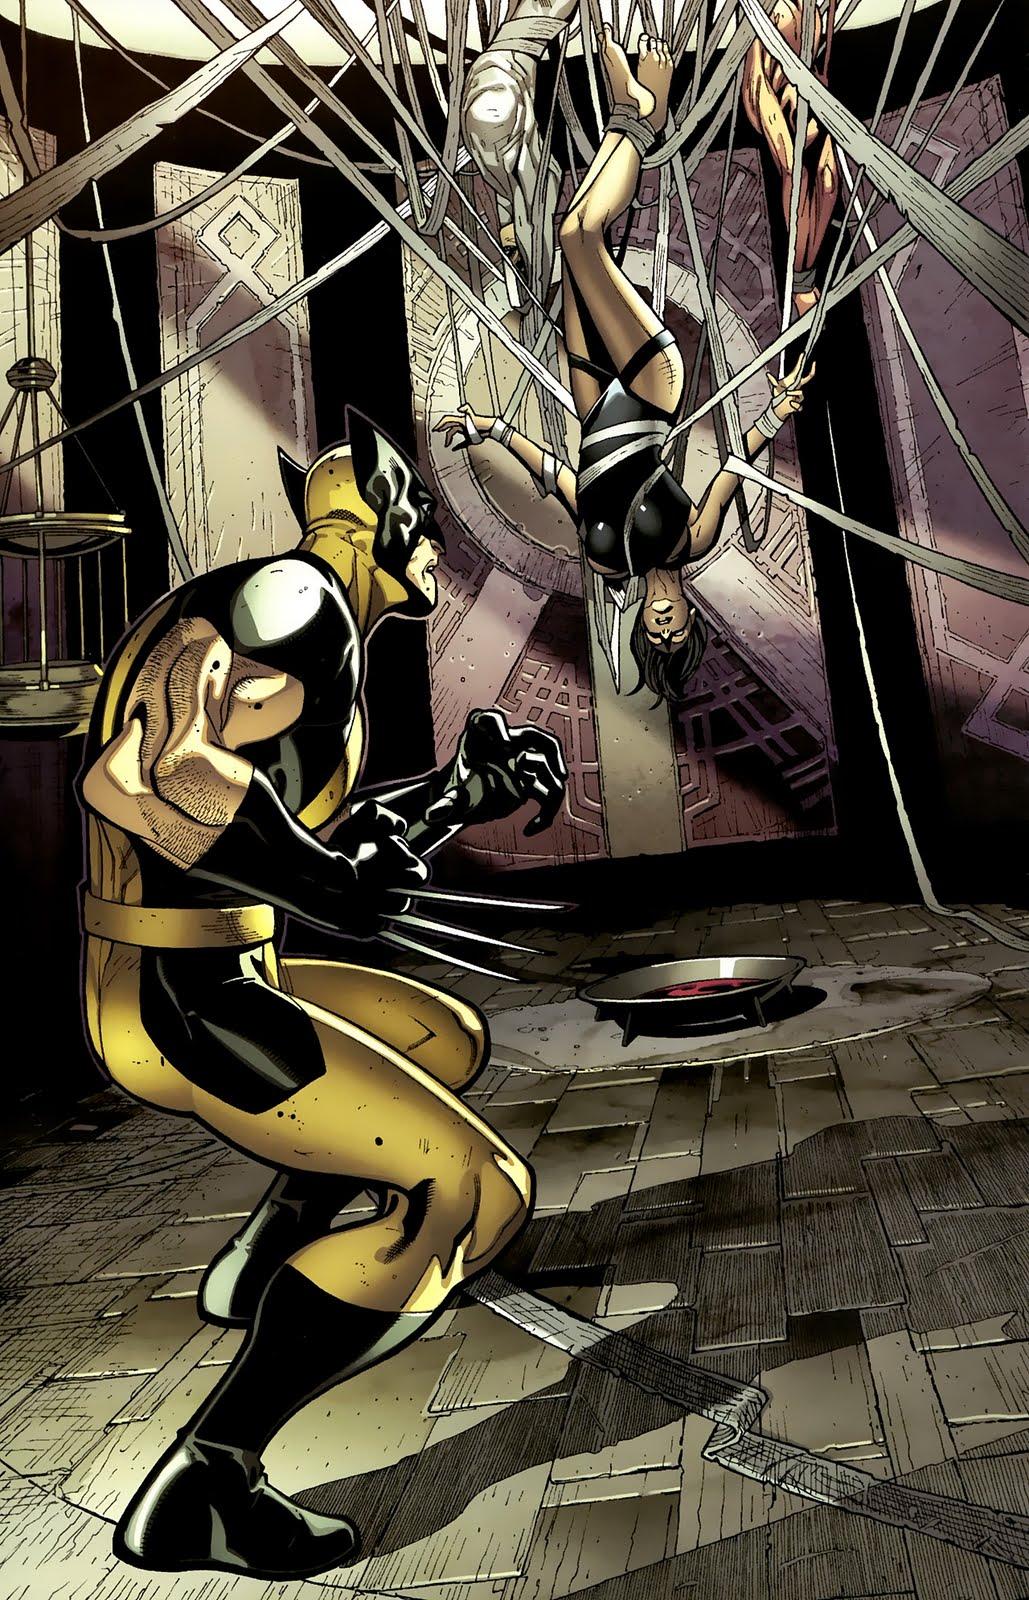 X-men bondage